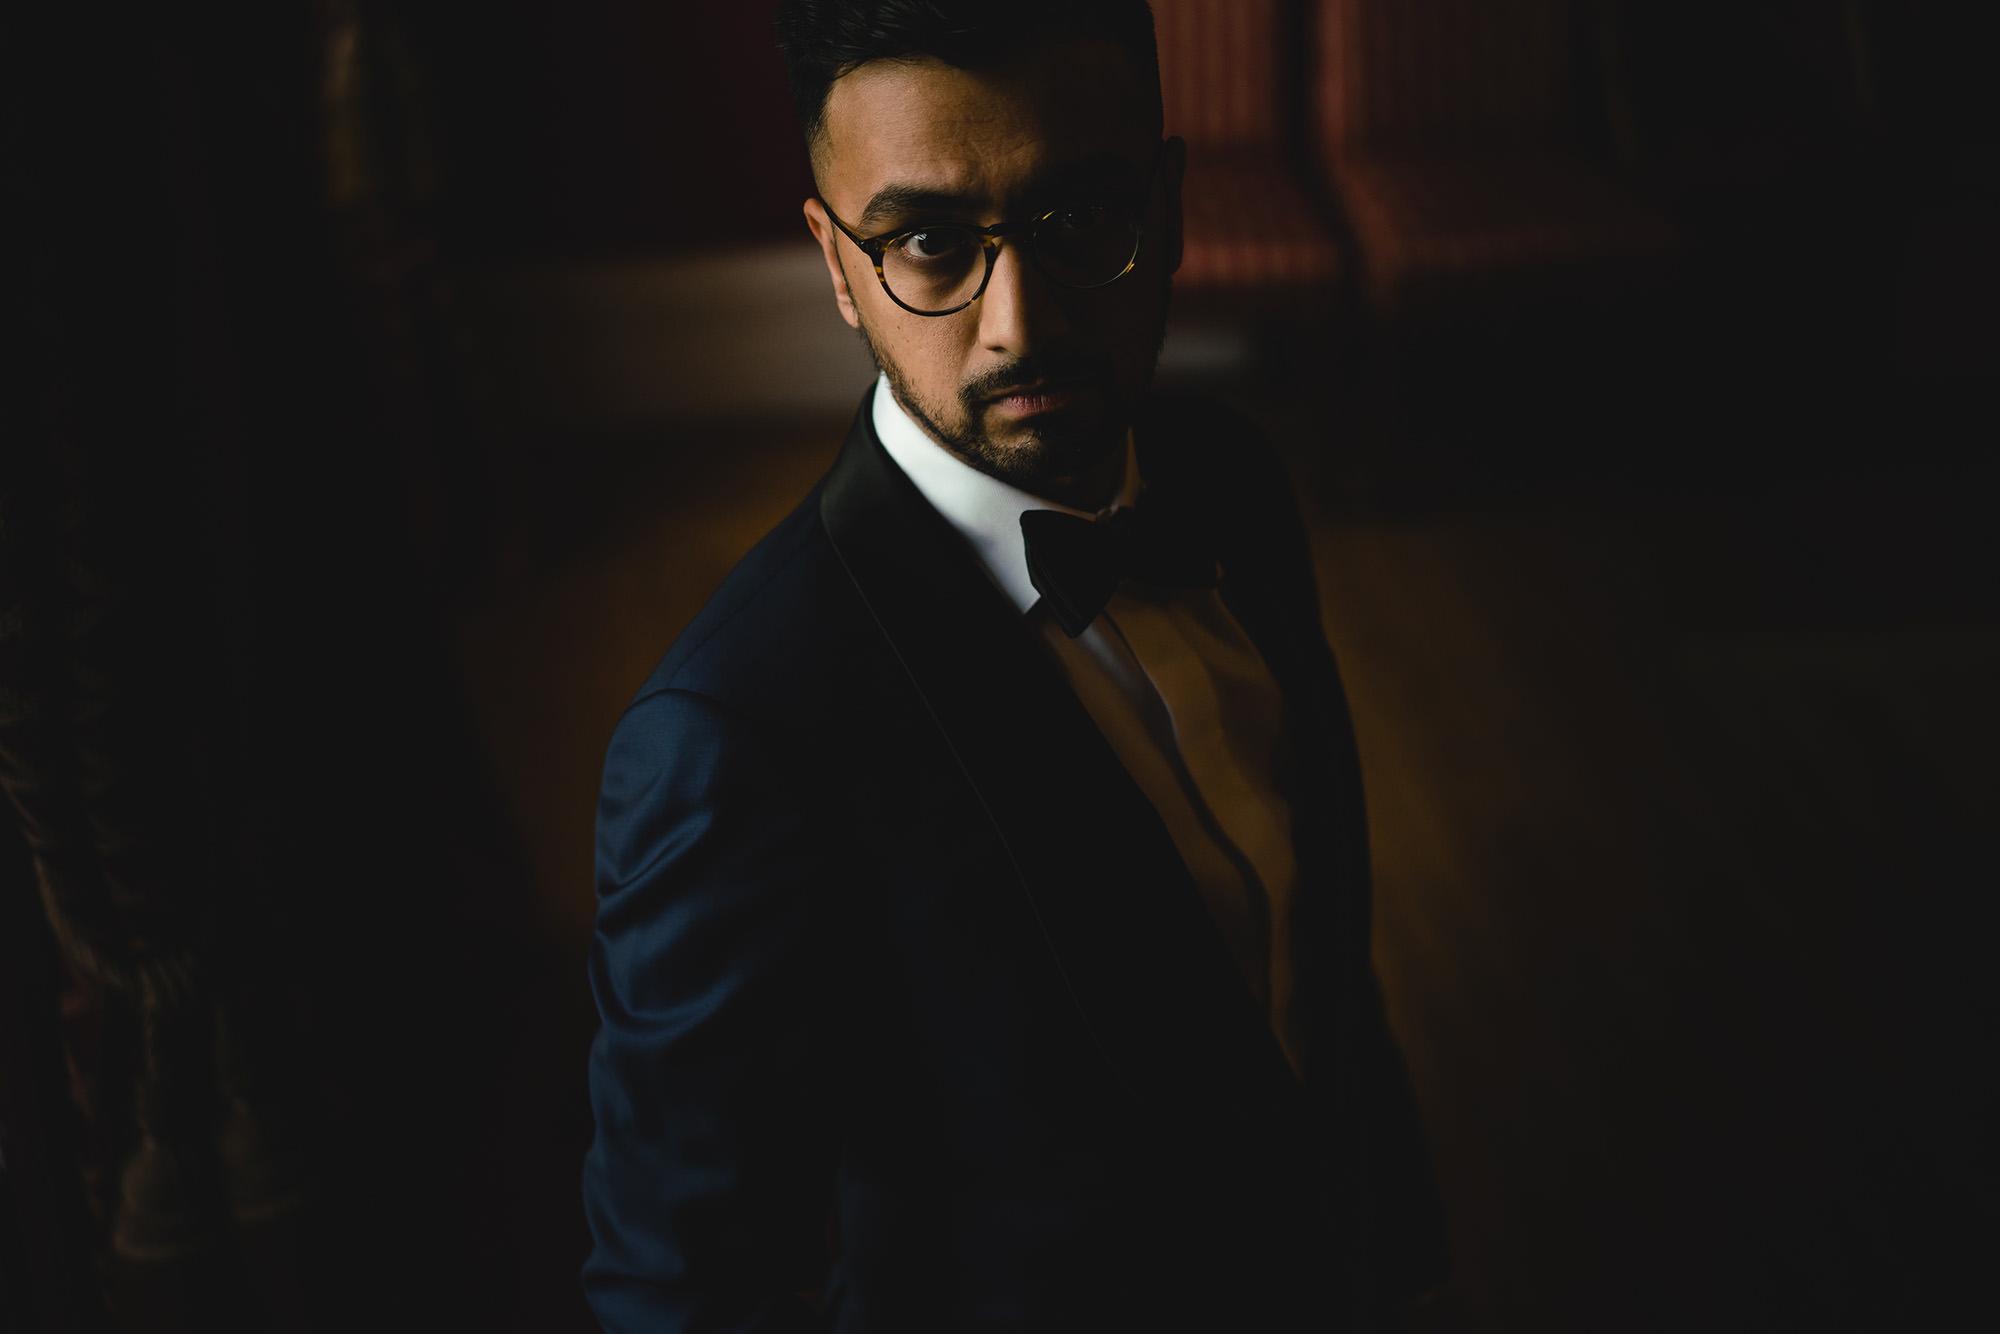 groom portrait in tuxedo